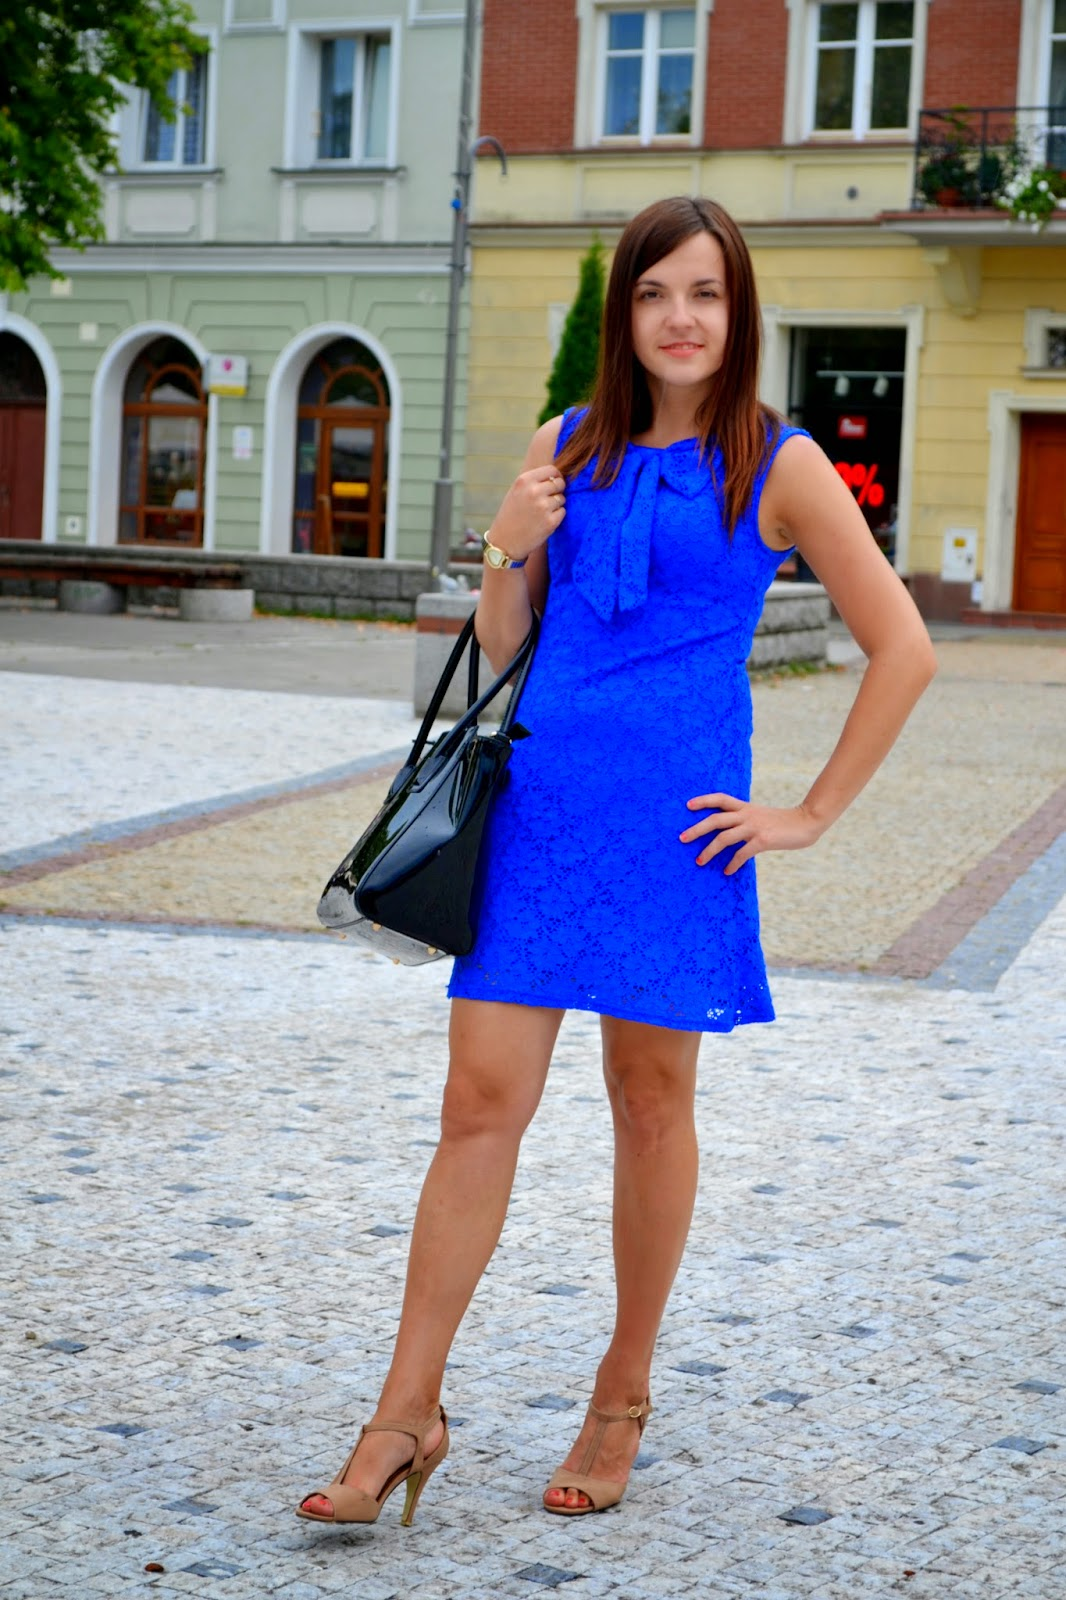 niebieska koronkowa sukienka, kolorowa sukienka, koronka, sukienka na wesele, niebieska sukienka z kokardą, dopasowana sukienka, obcisła sukienka